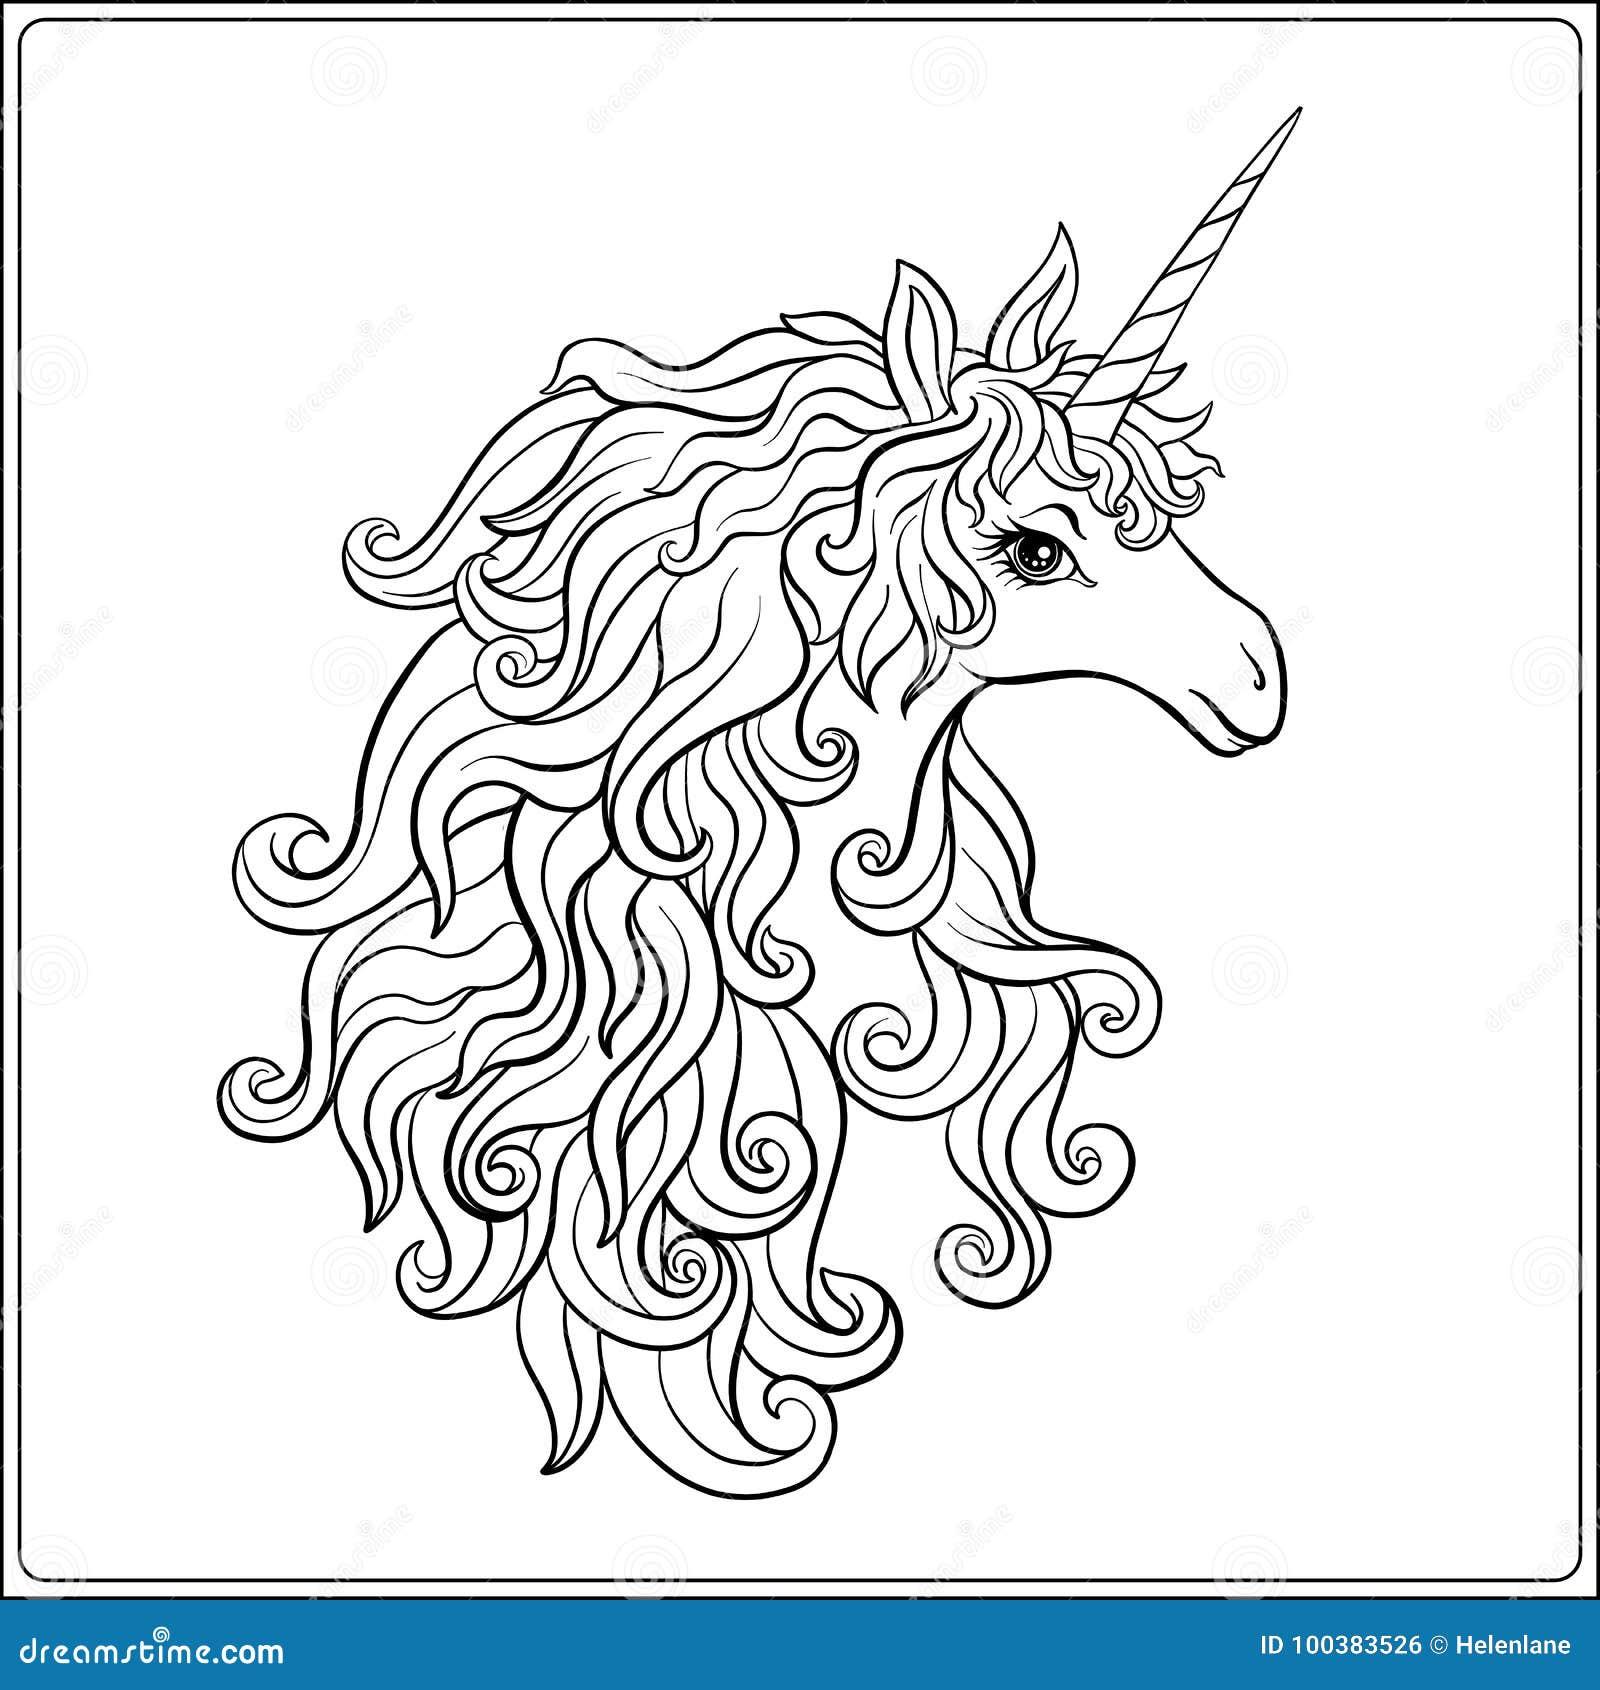 единорог страница расцветки чертежа плана книжка раскраска